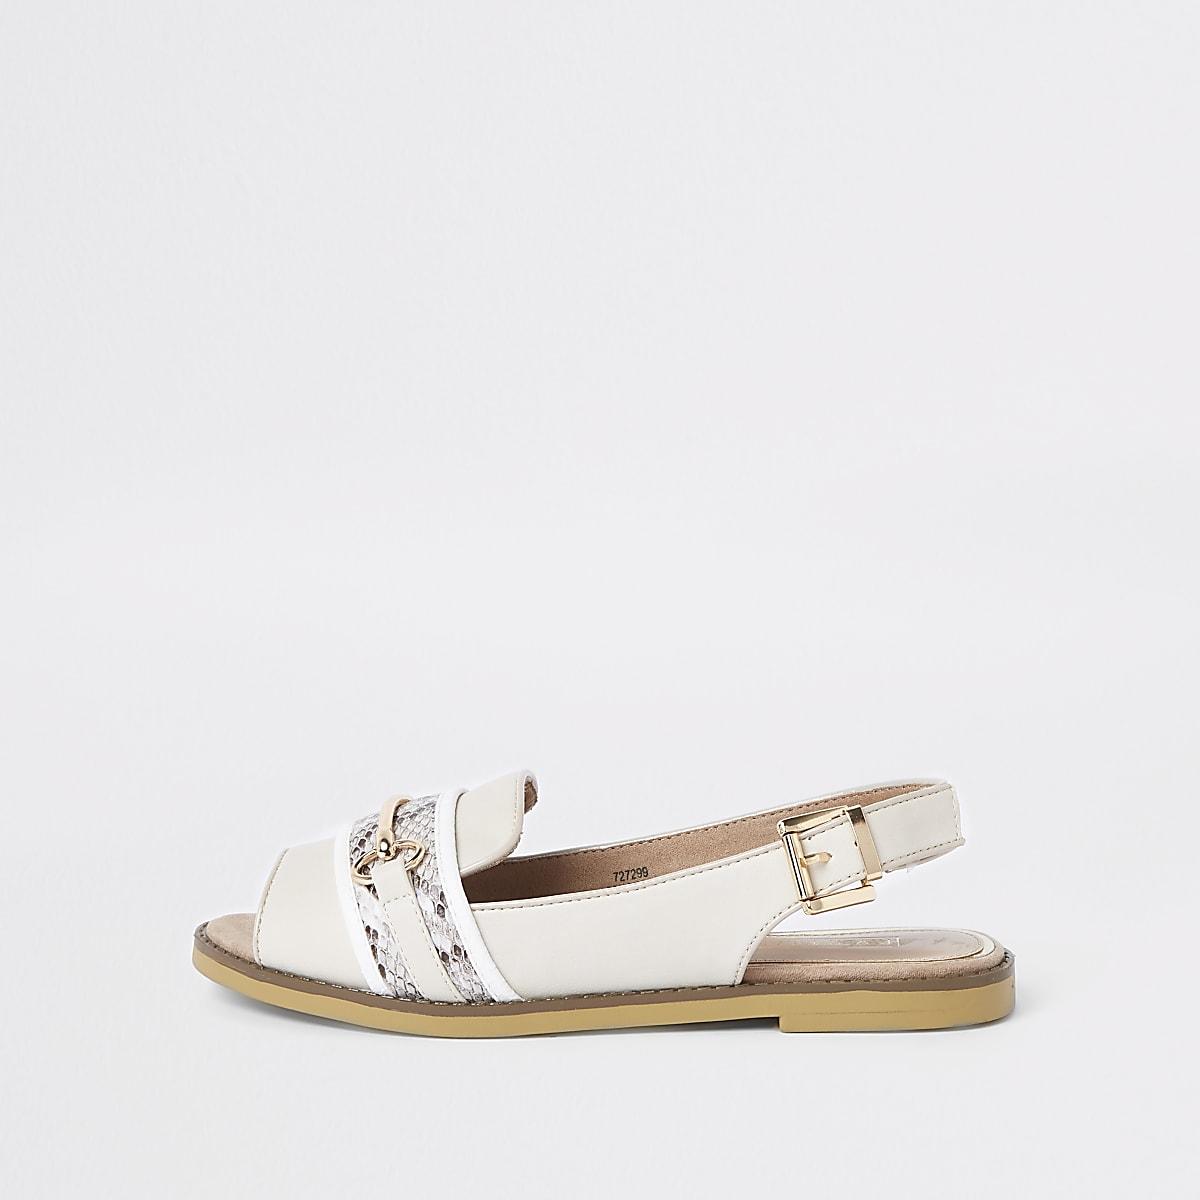 White snake print slingback peep toe loafers